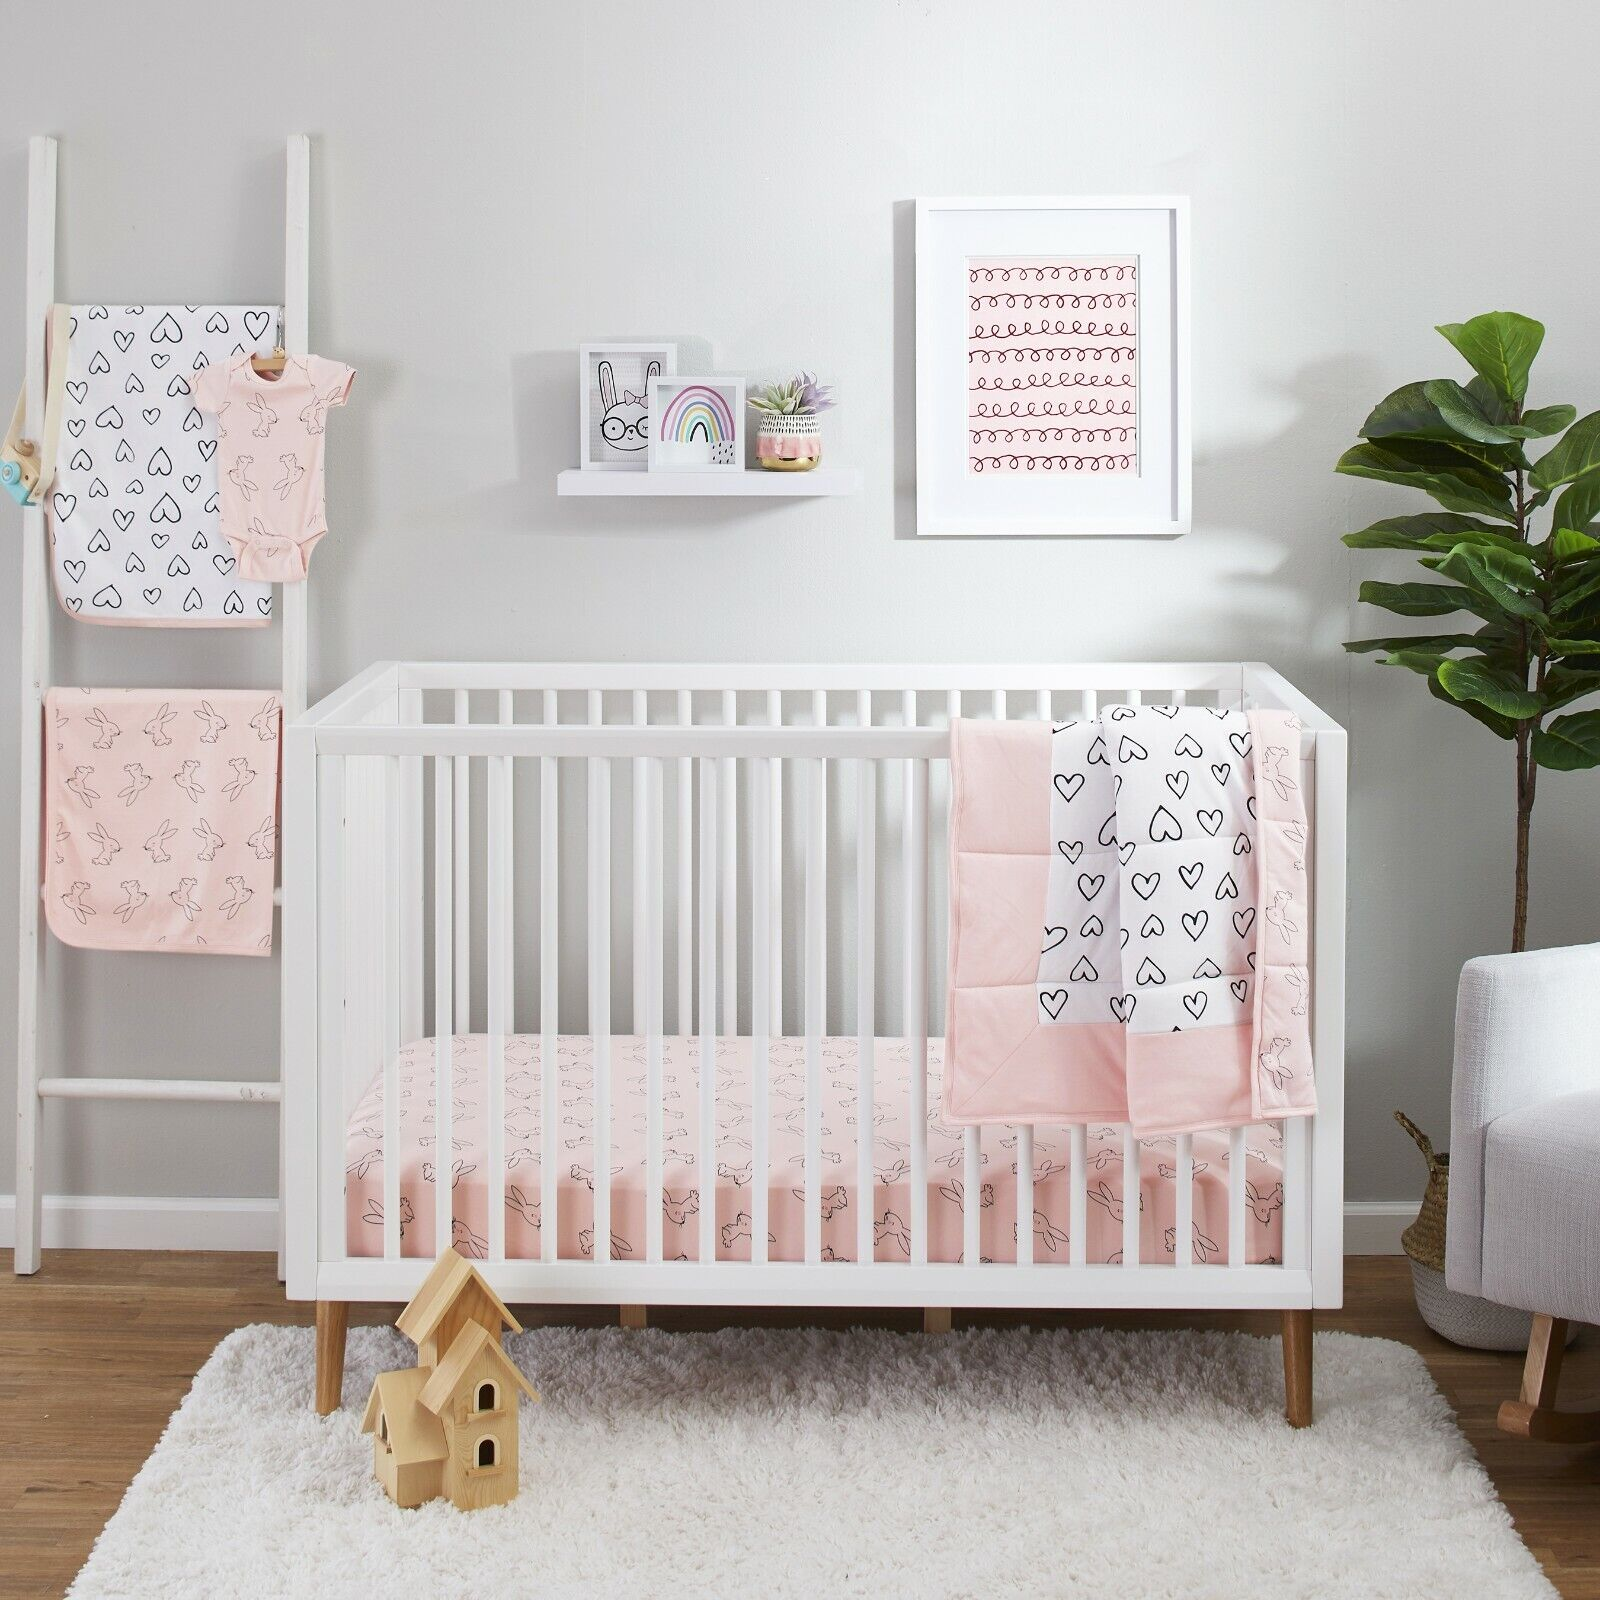 BRAND NEW Little Star Organic Pure Organic Cotton Crib Bedding Set, 3 Pc - $49.00